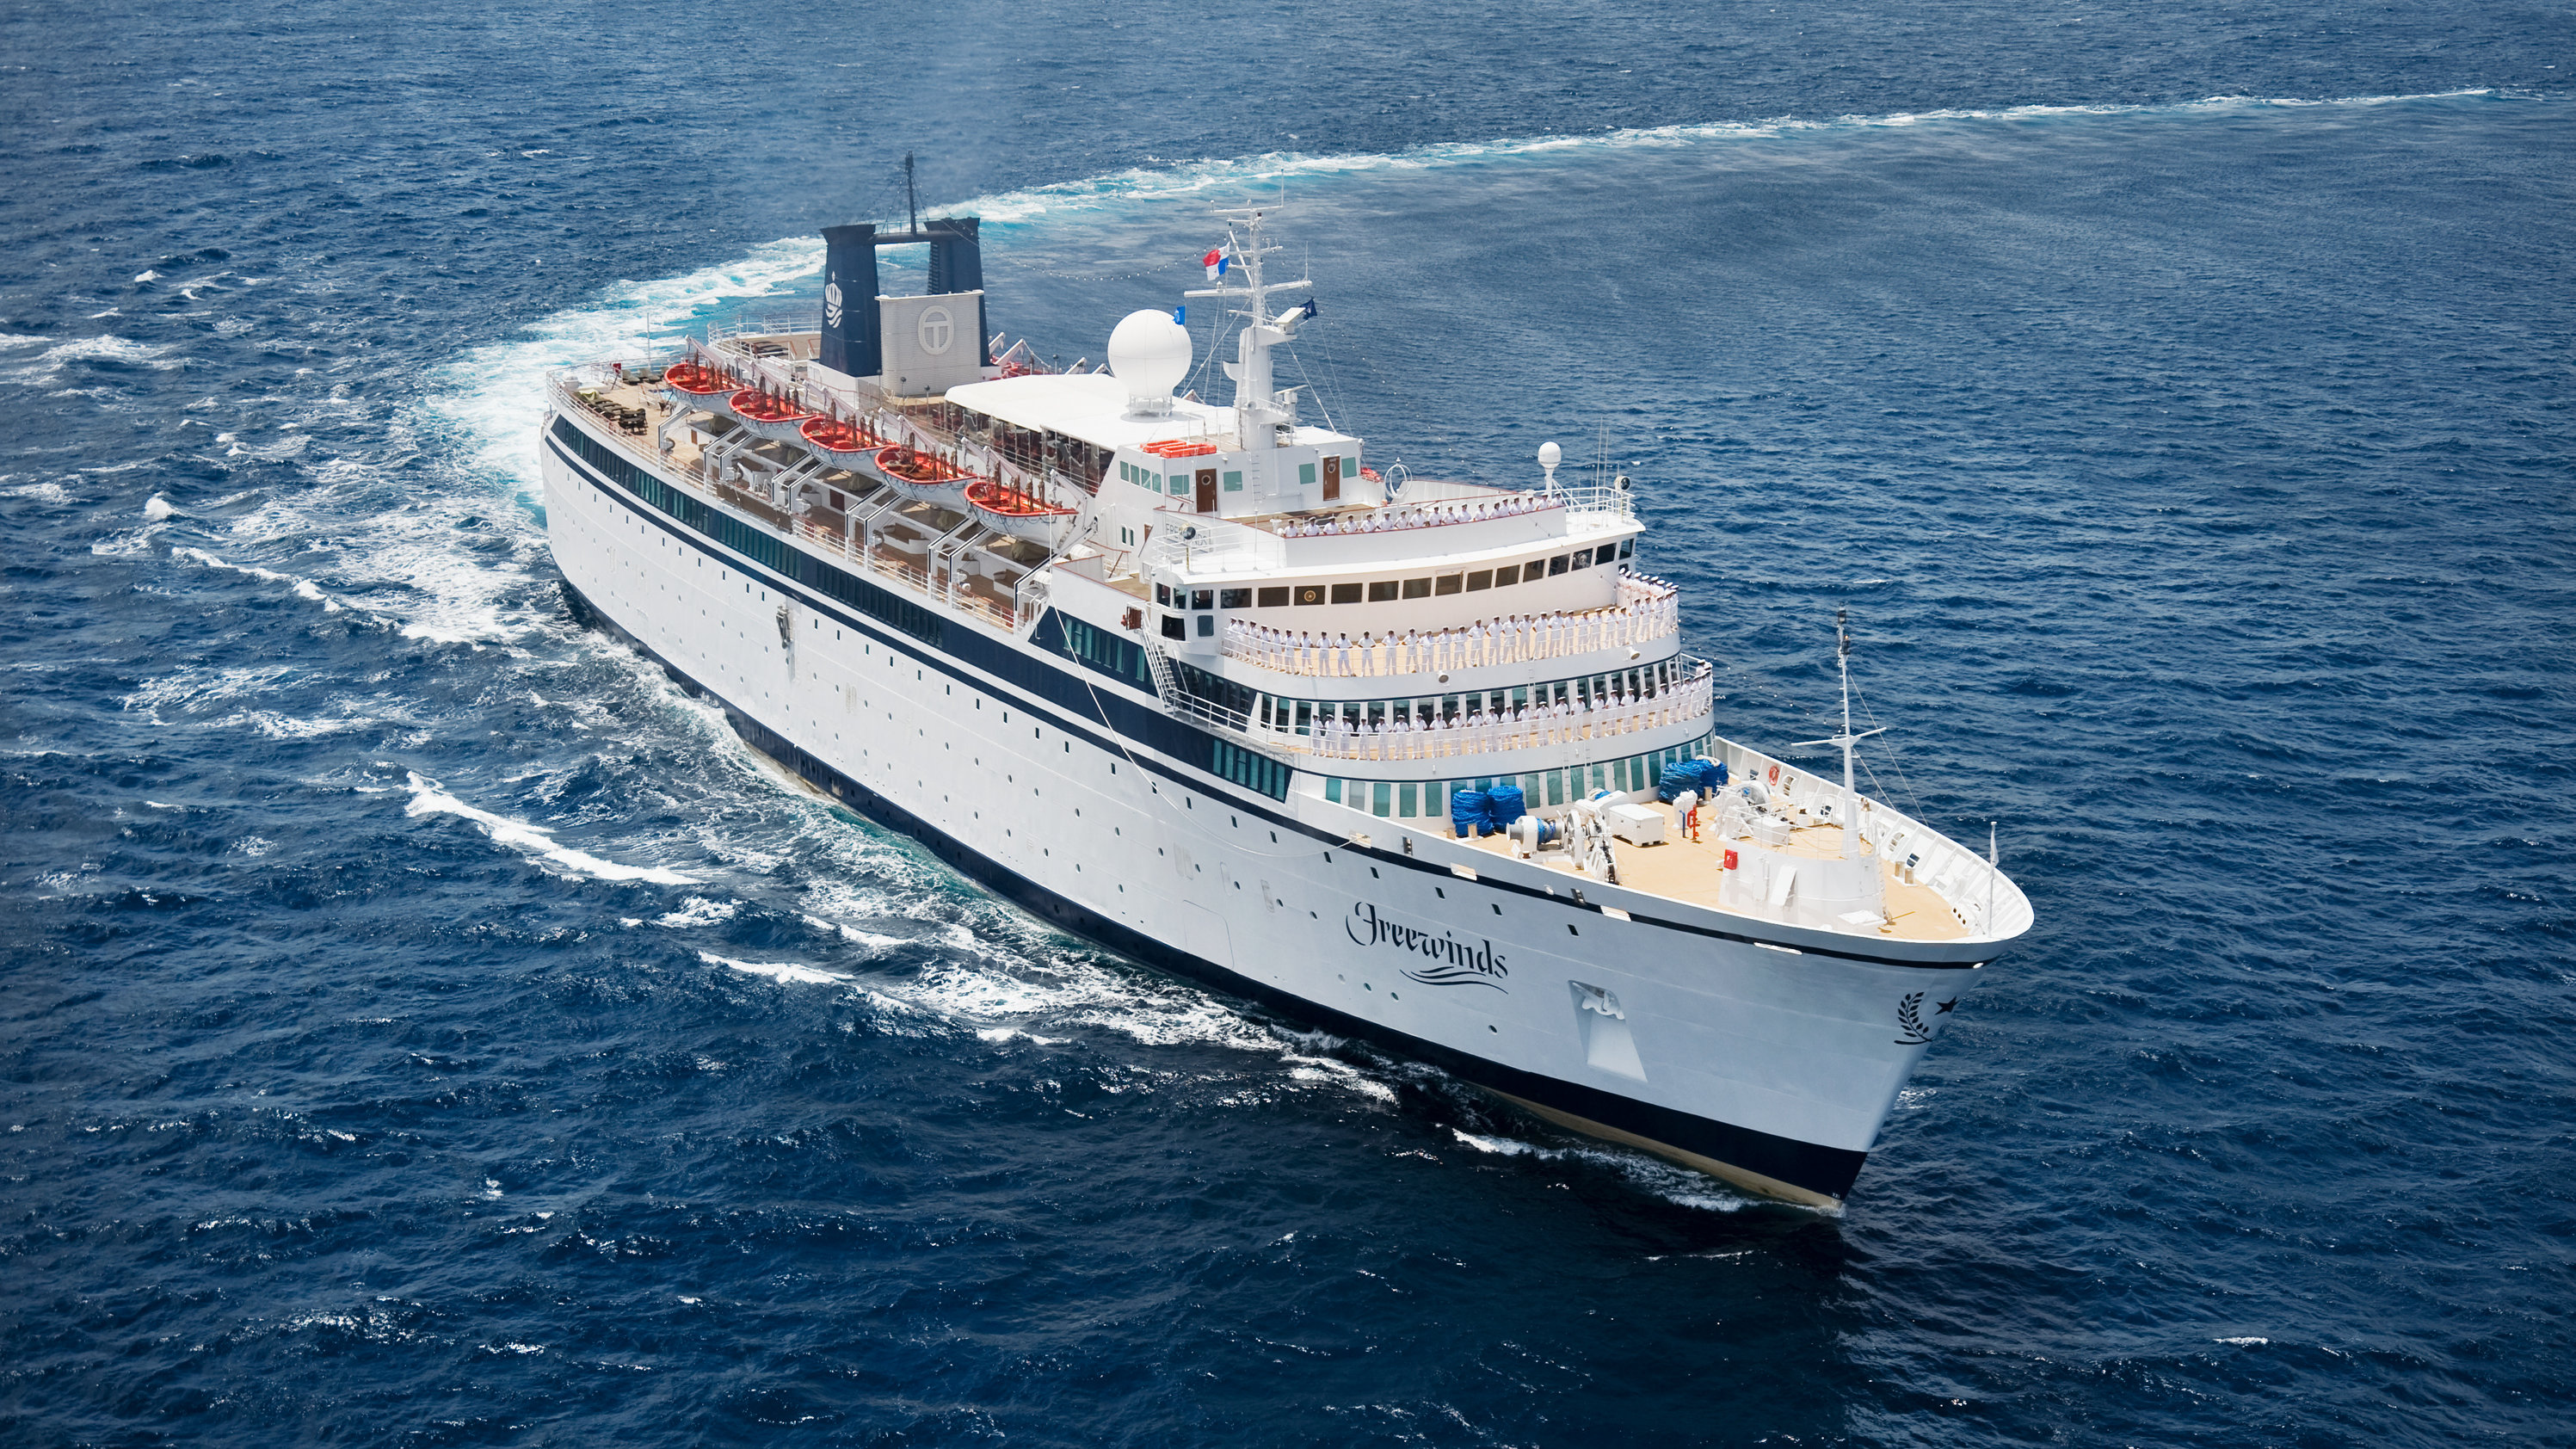 freewinds sea organization motor vessel